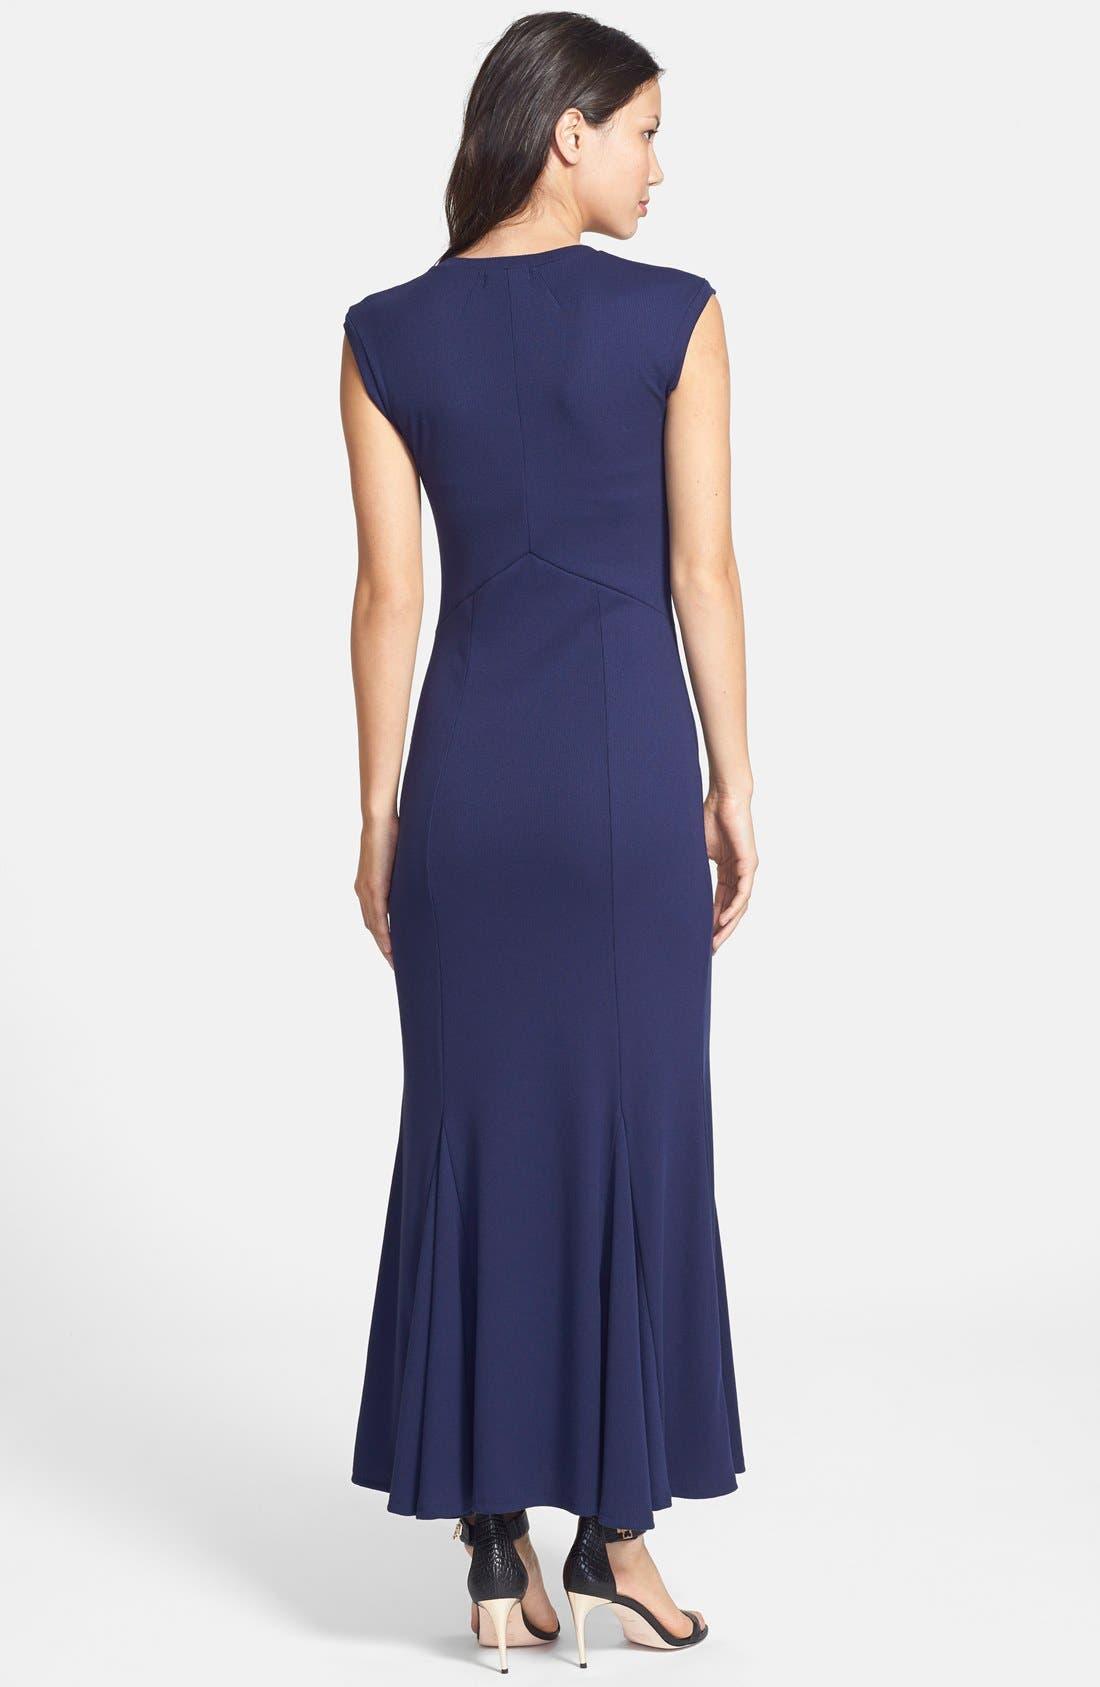 'Amber' Scoop Neck Maxi Dress,                             Alternate thumbnail 2, color,                             Navy